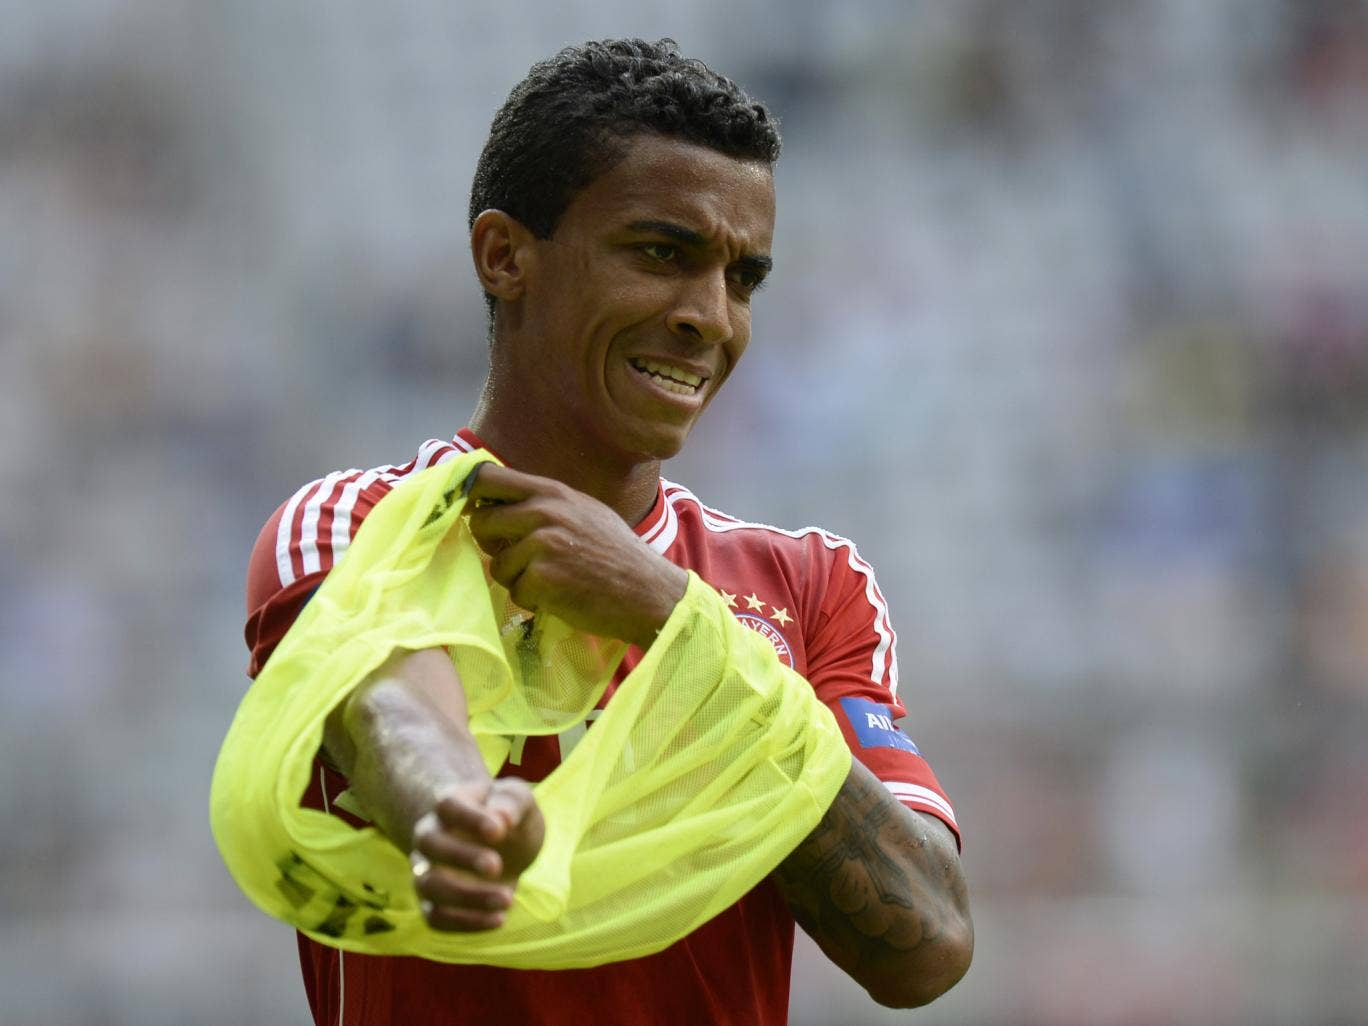 Arsenal are believed to be close to signing Bayern Munich midfielder Luiz Gustavo